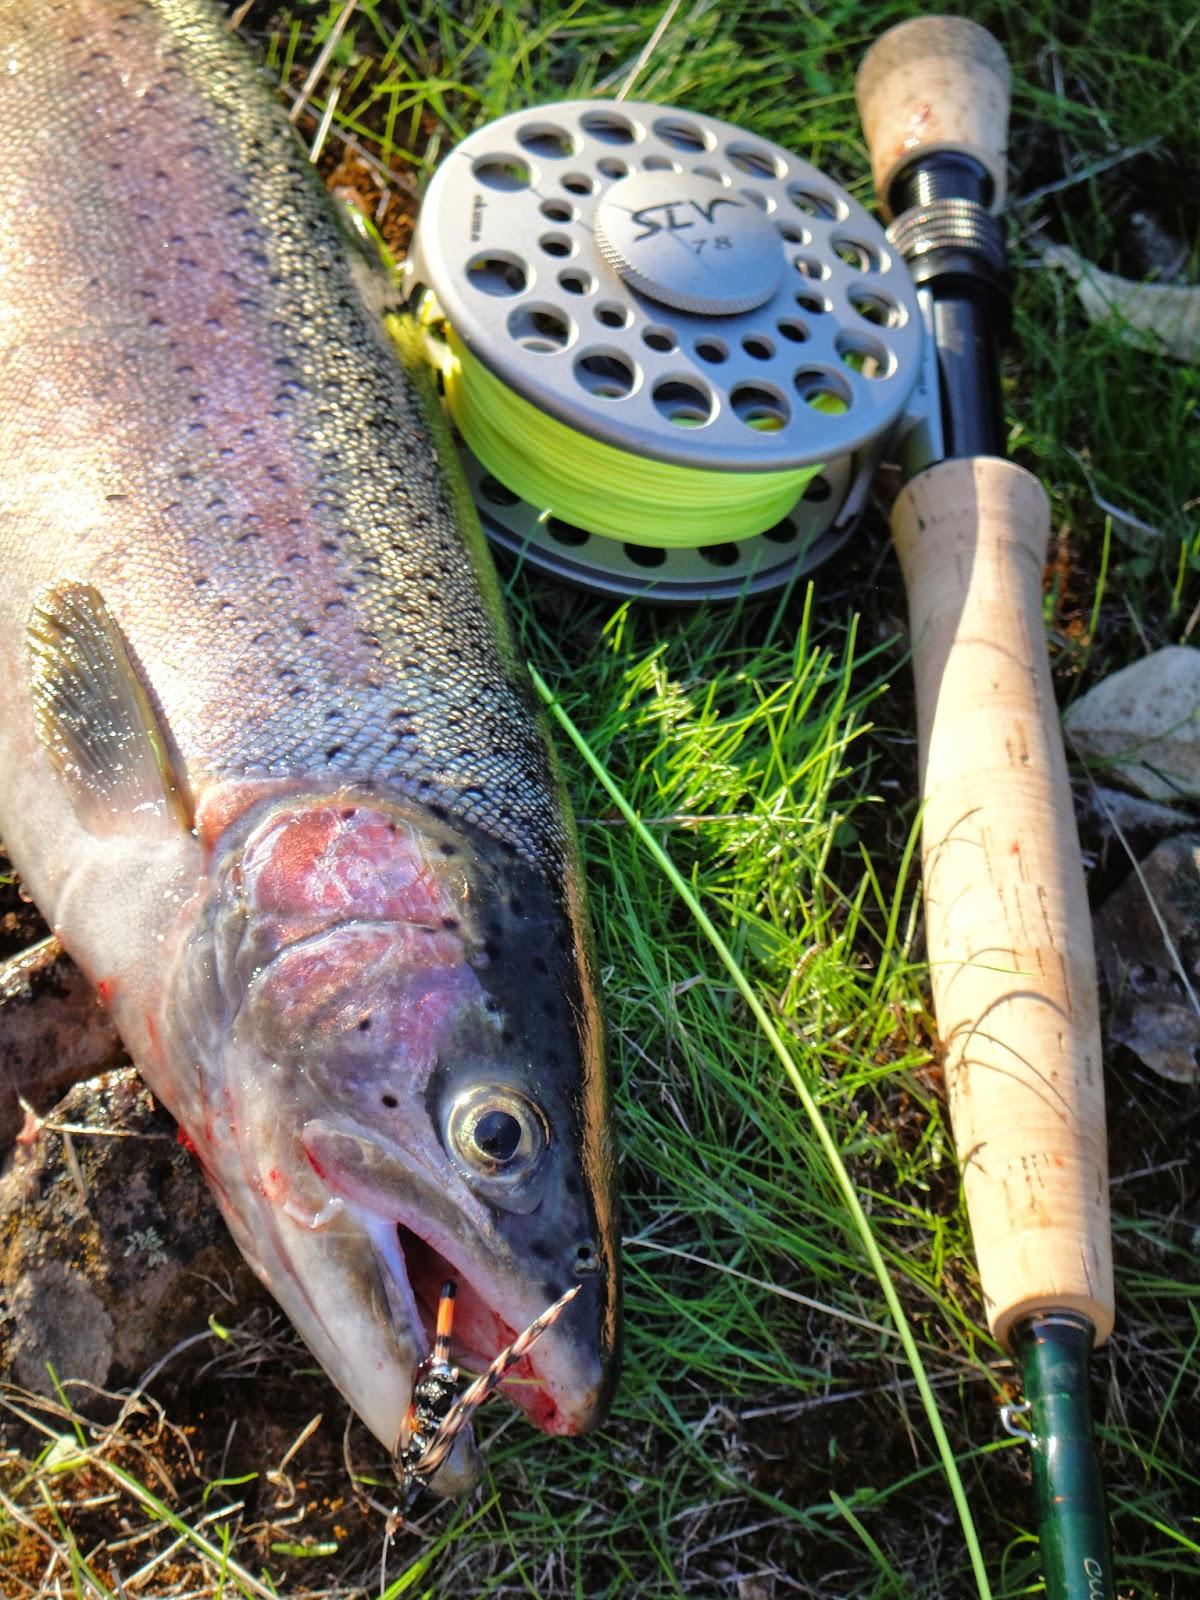 Fly fishing for steelhead rogue river fishing guides for Fly fishing for steelhead